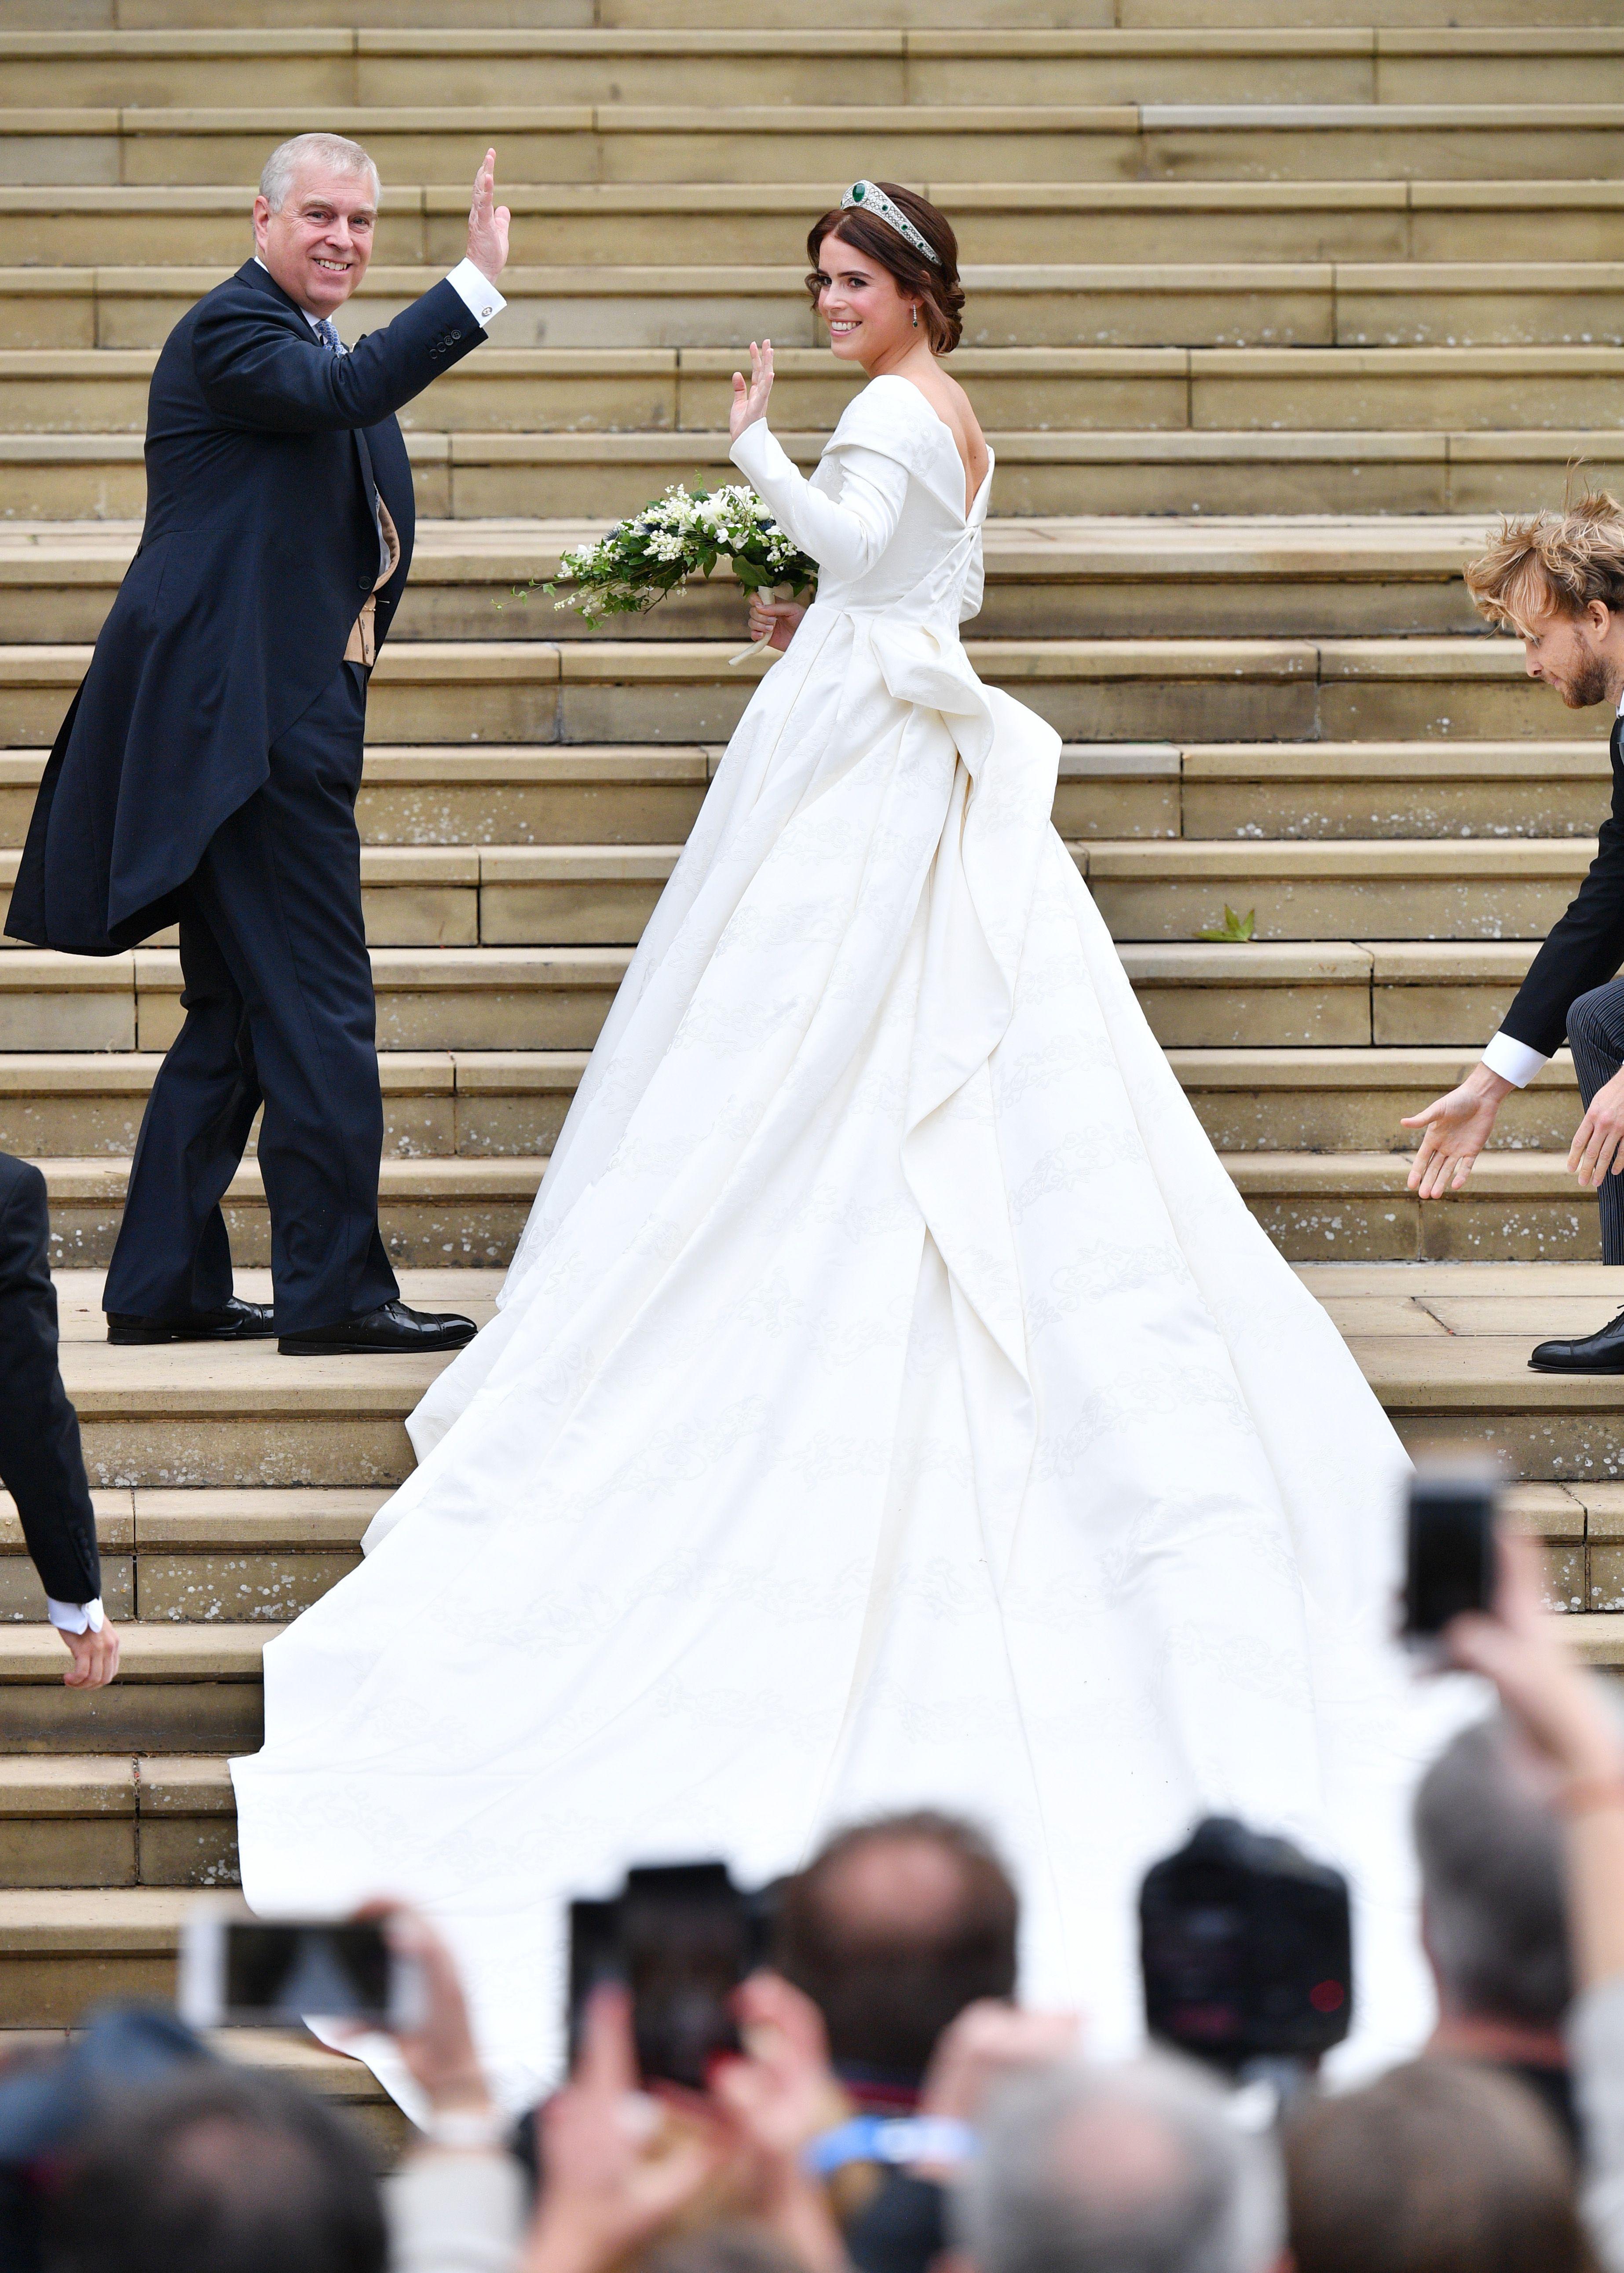 Zac Posen Shares Previously Unseen Photo Of Princess Eugenie S Second Wedding Dress Eugenie Wedding Royal Wedding Dress Royal Brides [ 5167 x 3692 Pixel ]